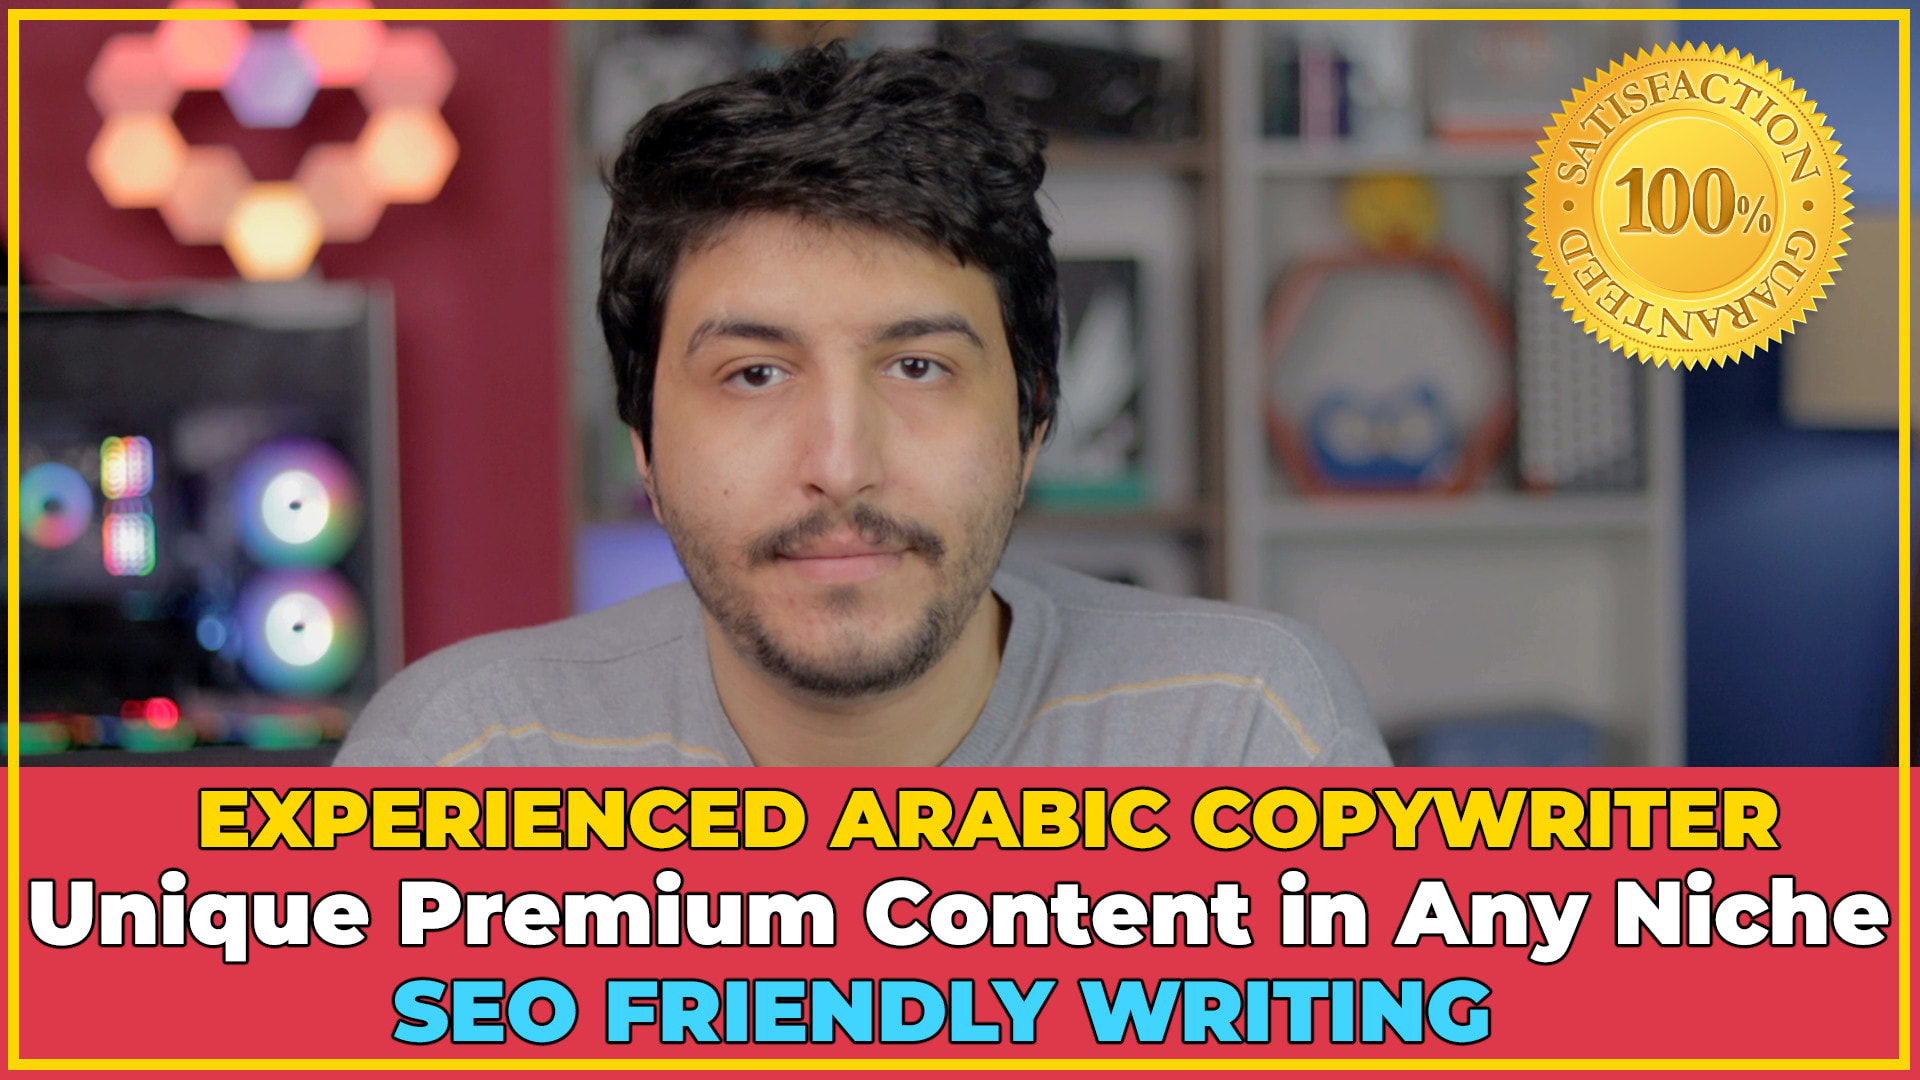 I will write unique high quality arabic content in any niche